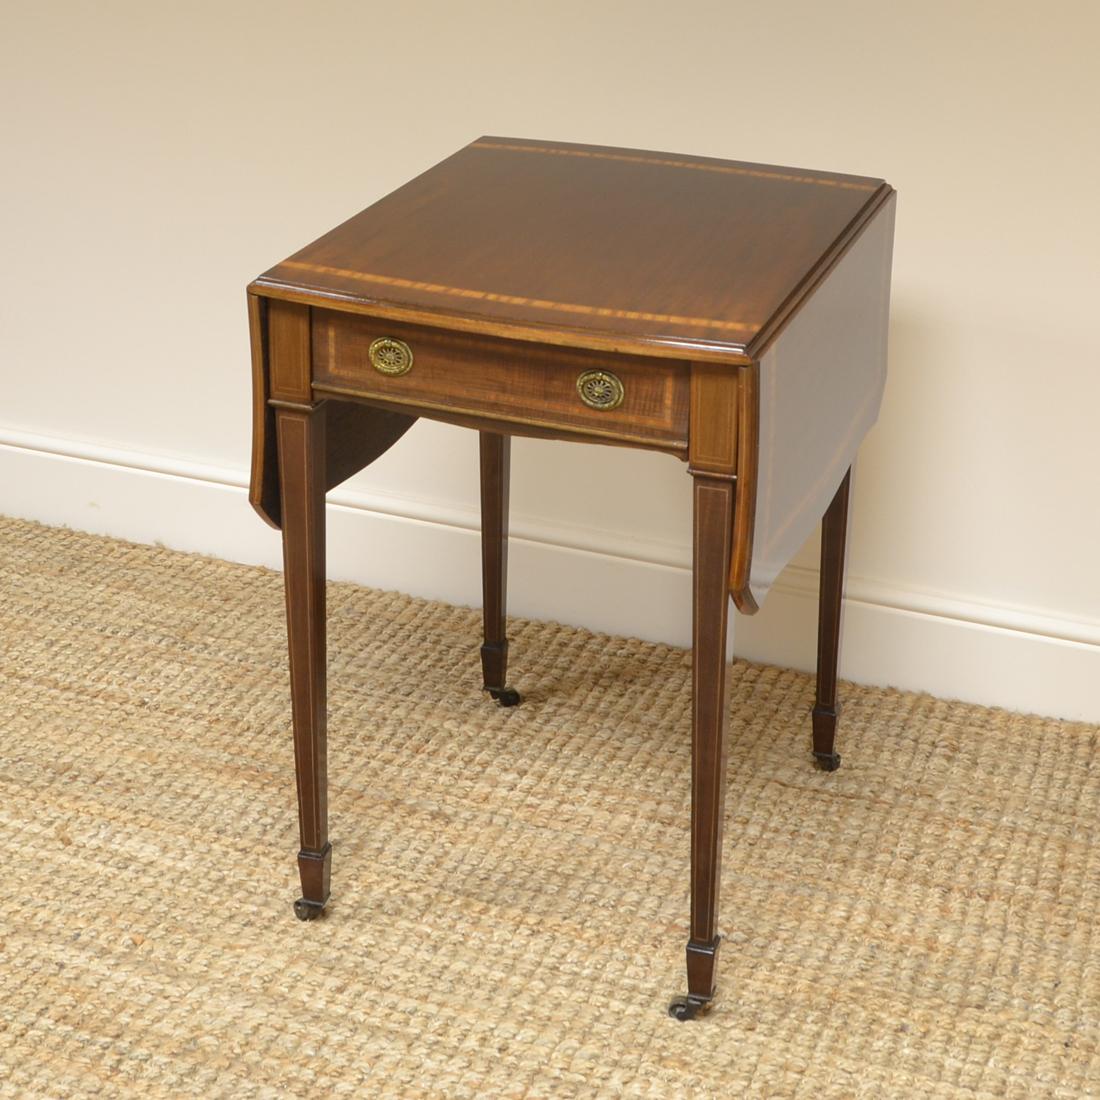 Stunning Quality Edwardian Mahogany Antique Drop Leaf Side Table 06310 La155315 Loveantiques Com